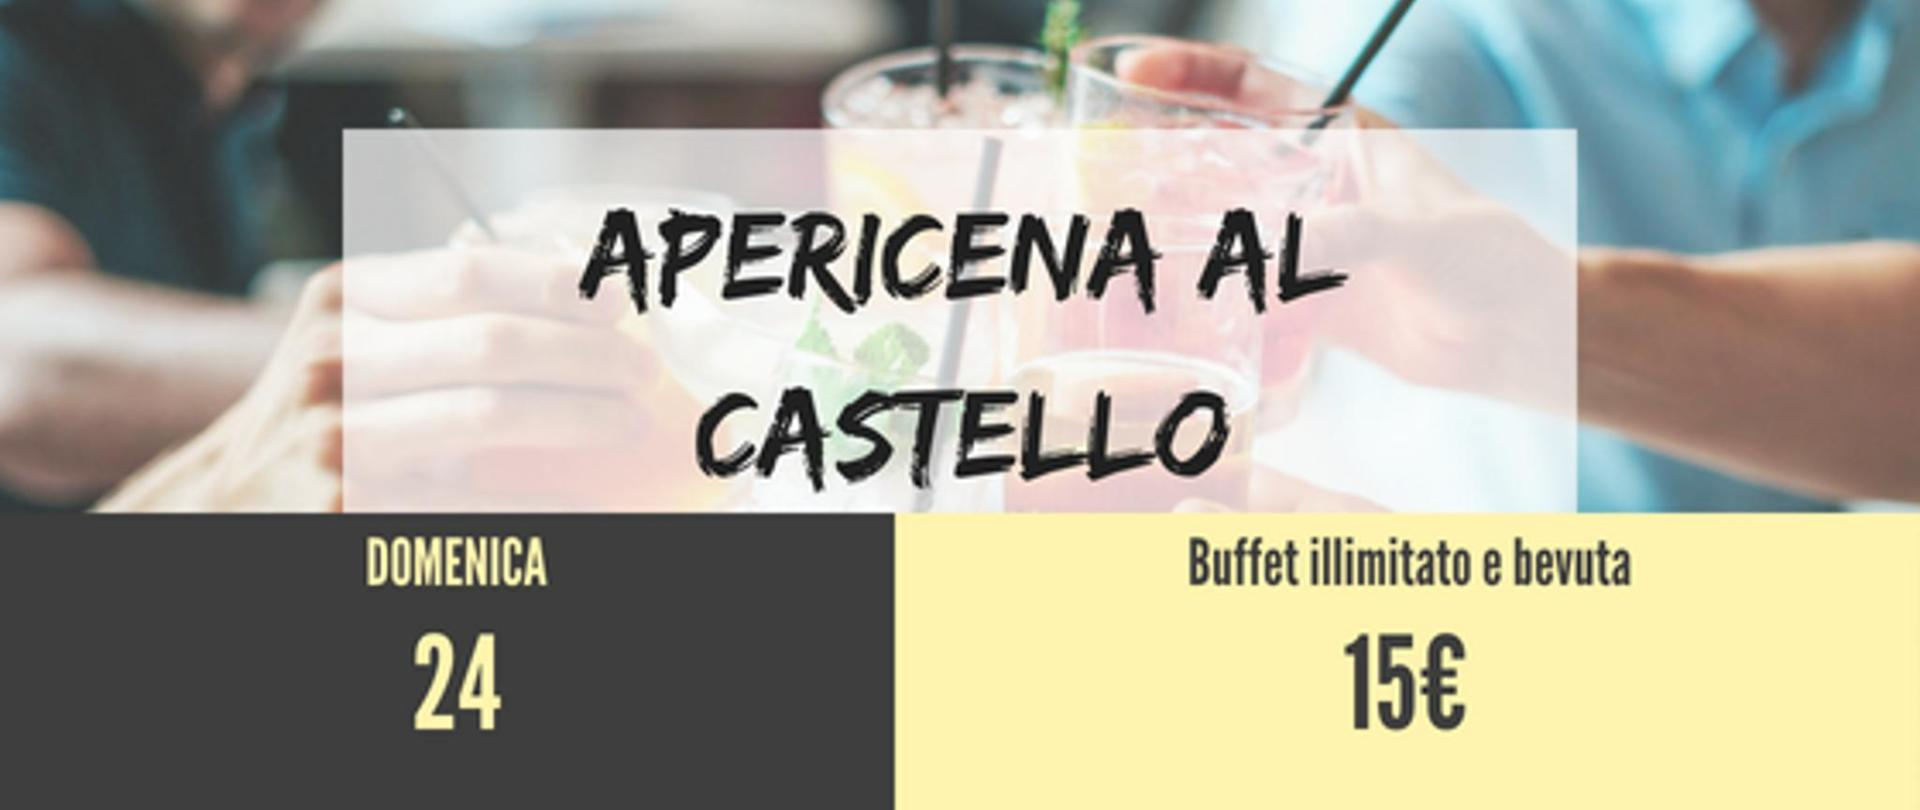 APERICENA AL CASTELLO (1) .png